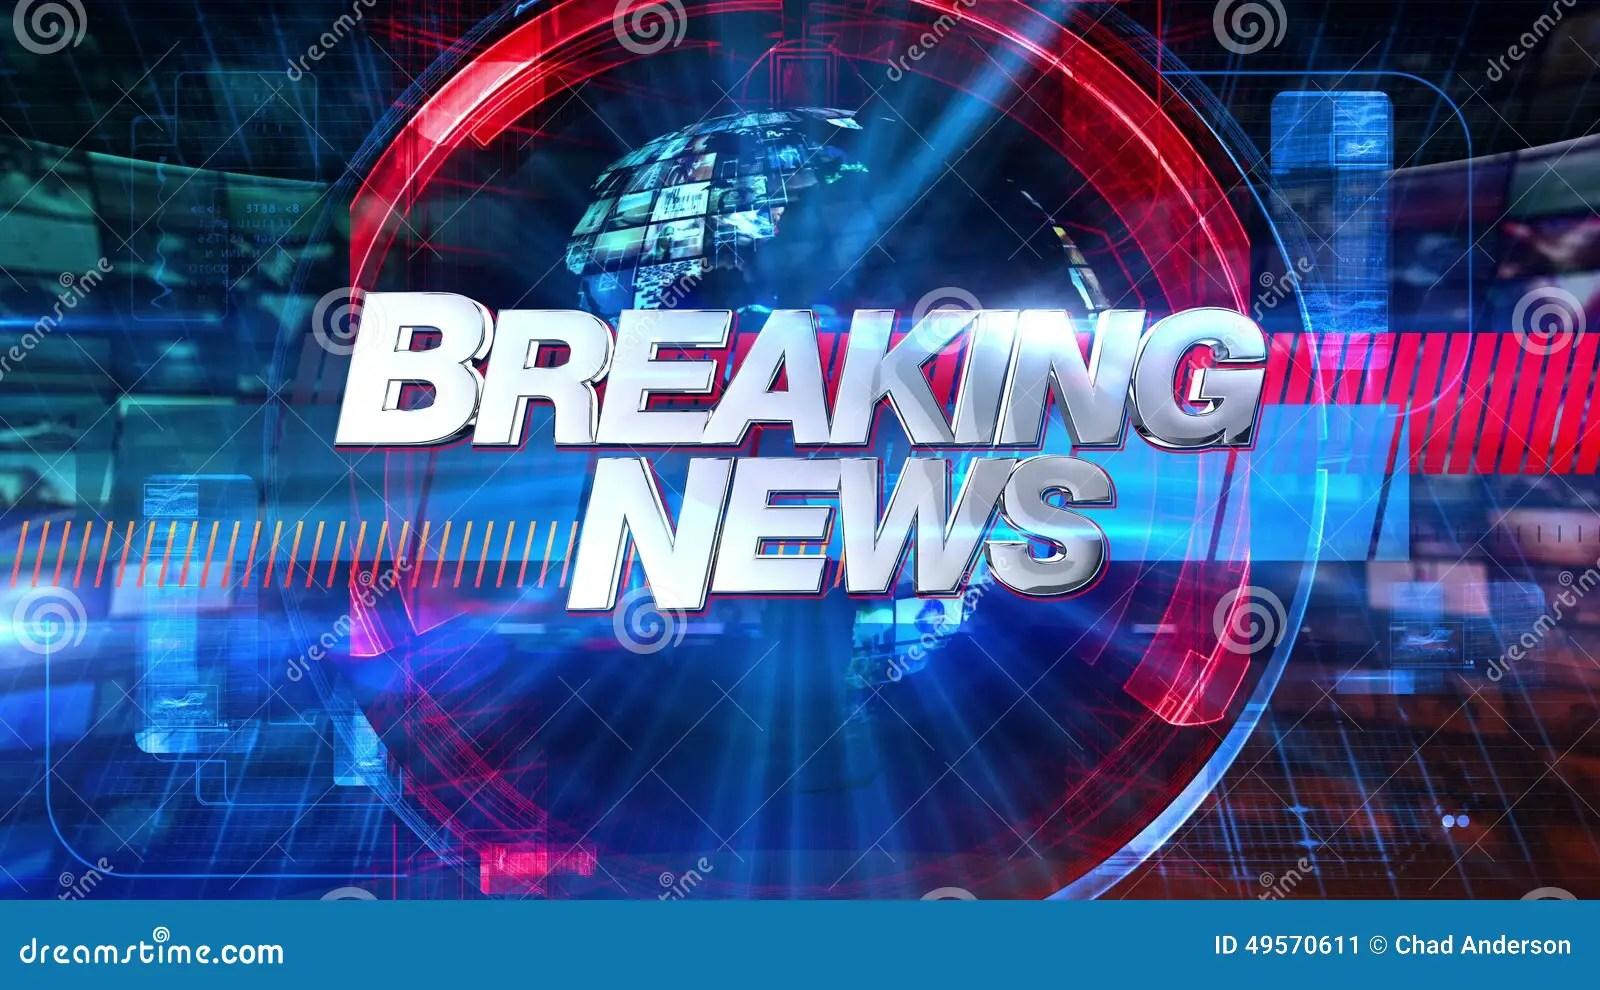 Wallpaper Hd Portrait Orientation Breaking News Broadcast Animation Graphic Title 4k Stock